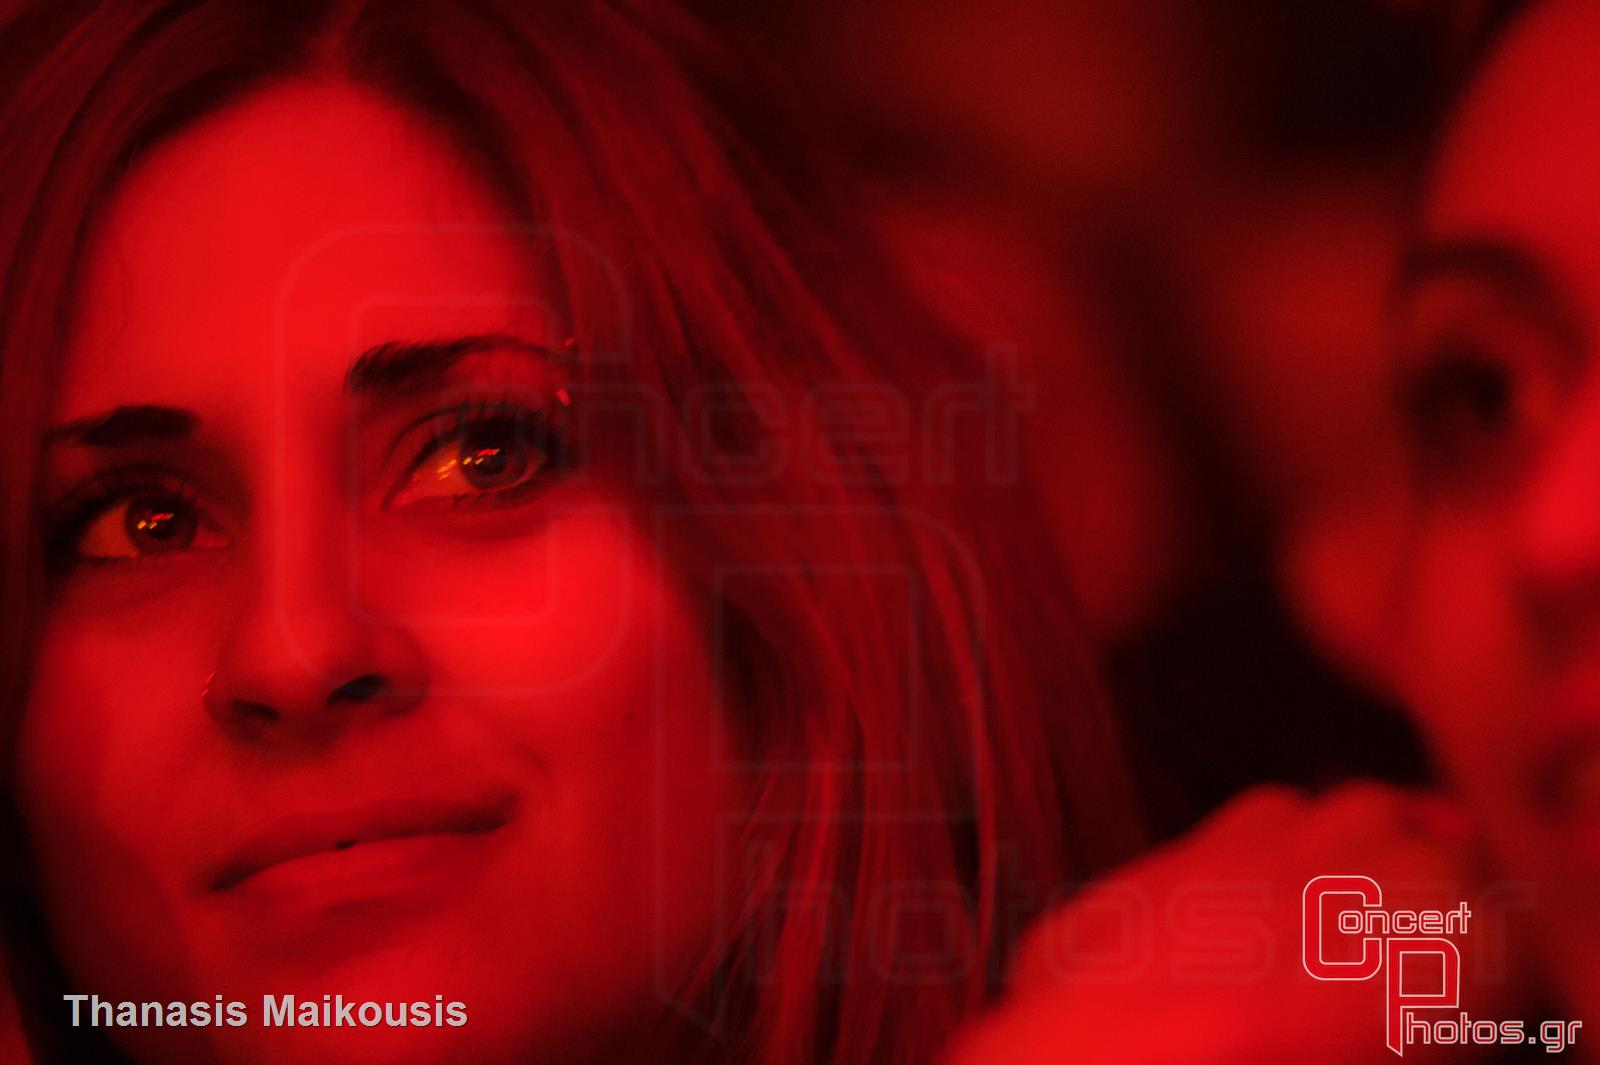 Active Member - Τραγούδα μας να φύγει το σκοτάδι- photographer: Thanasis Maikousis - concertphotos_-5369